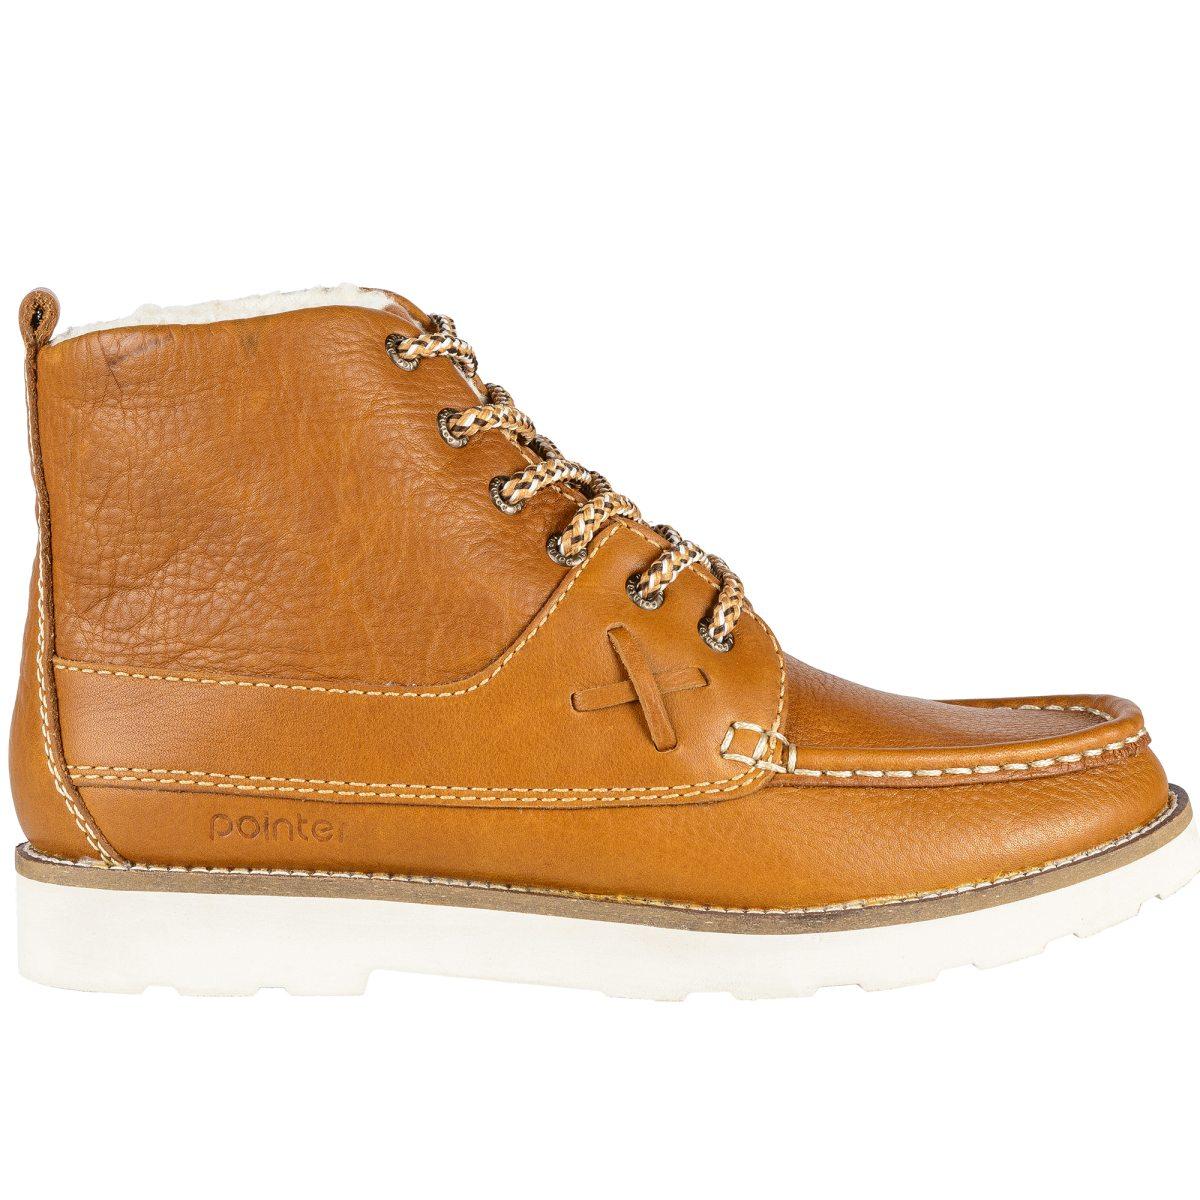 4e4c1055ed7 kavat svappavara ep skor vinterskor finns på PricePi.com.